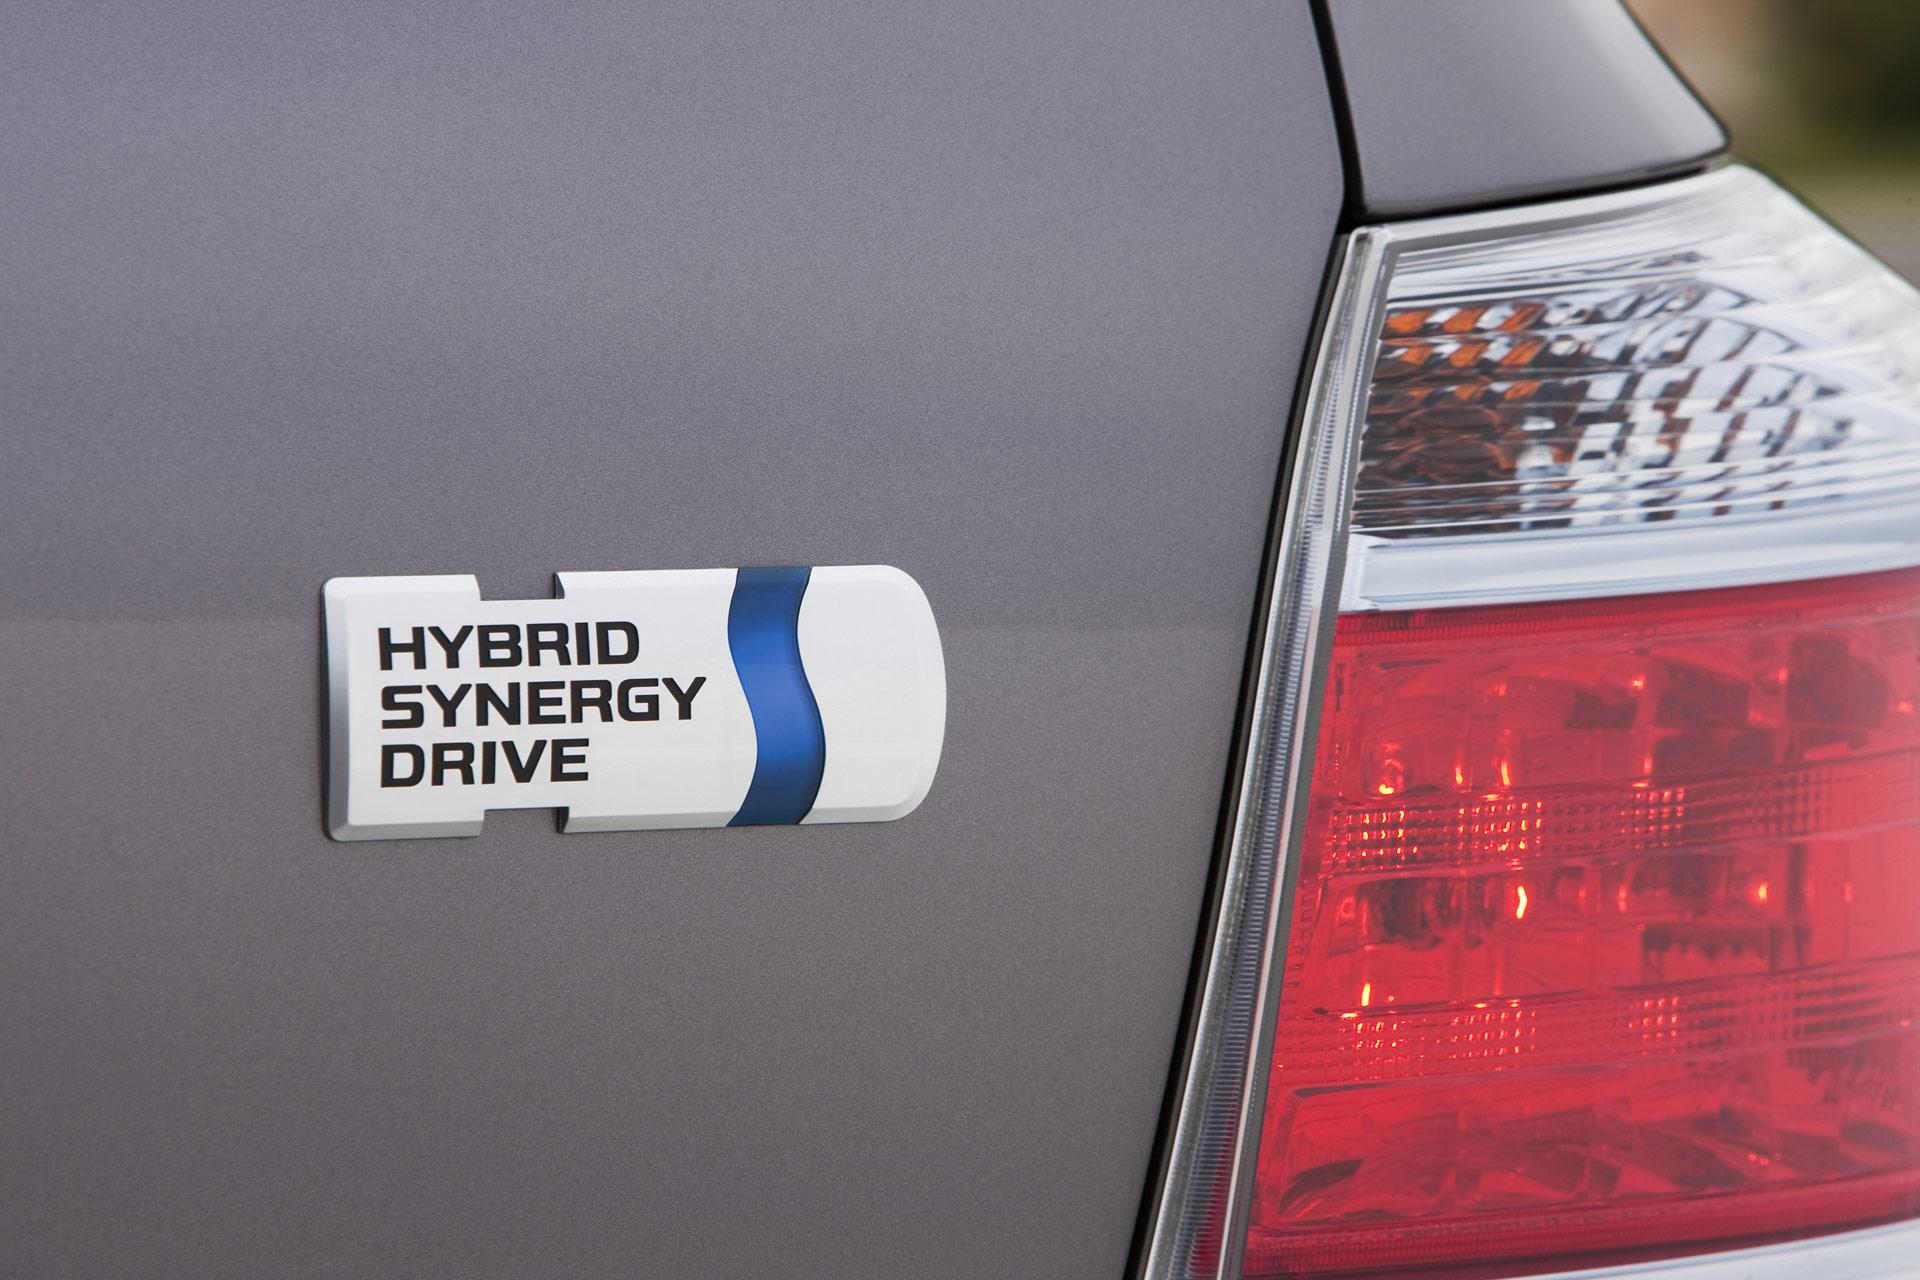 2013 Toyota Highlander Hybrid Image